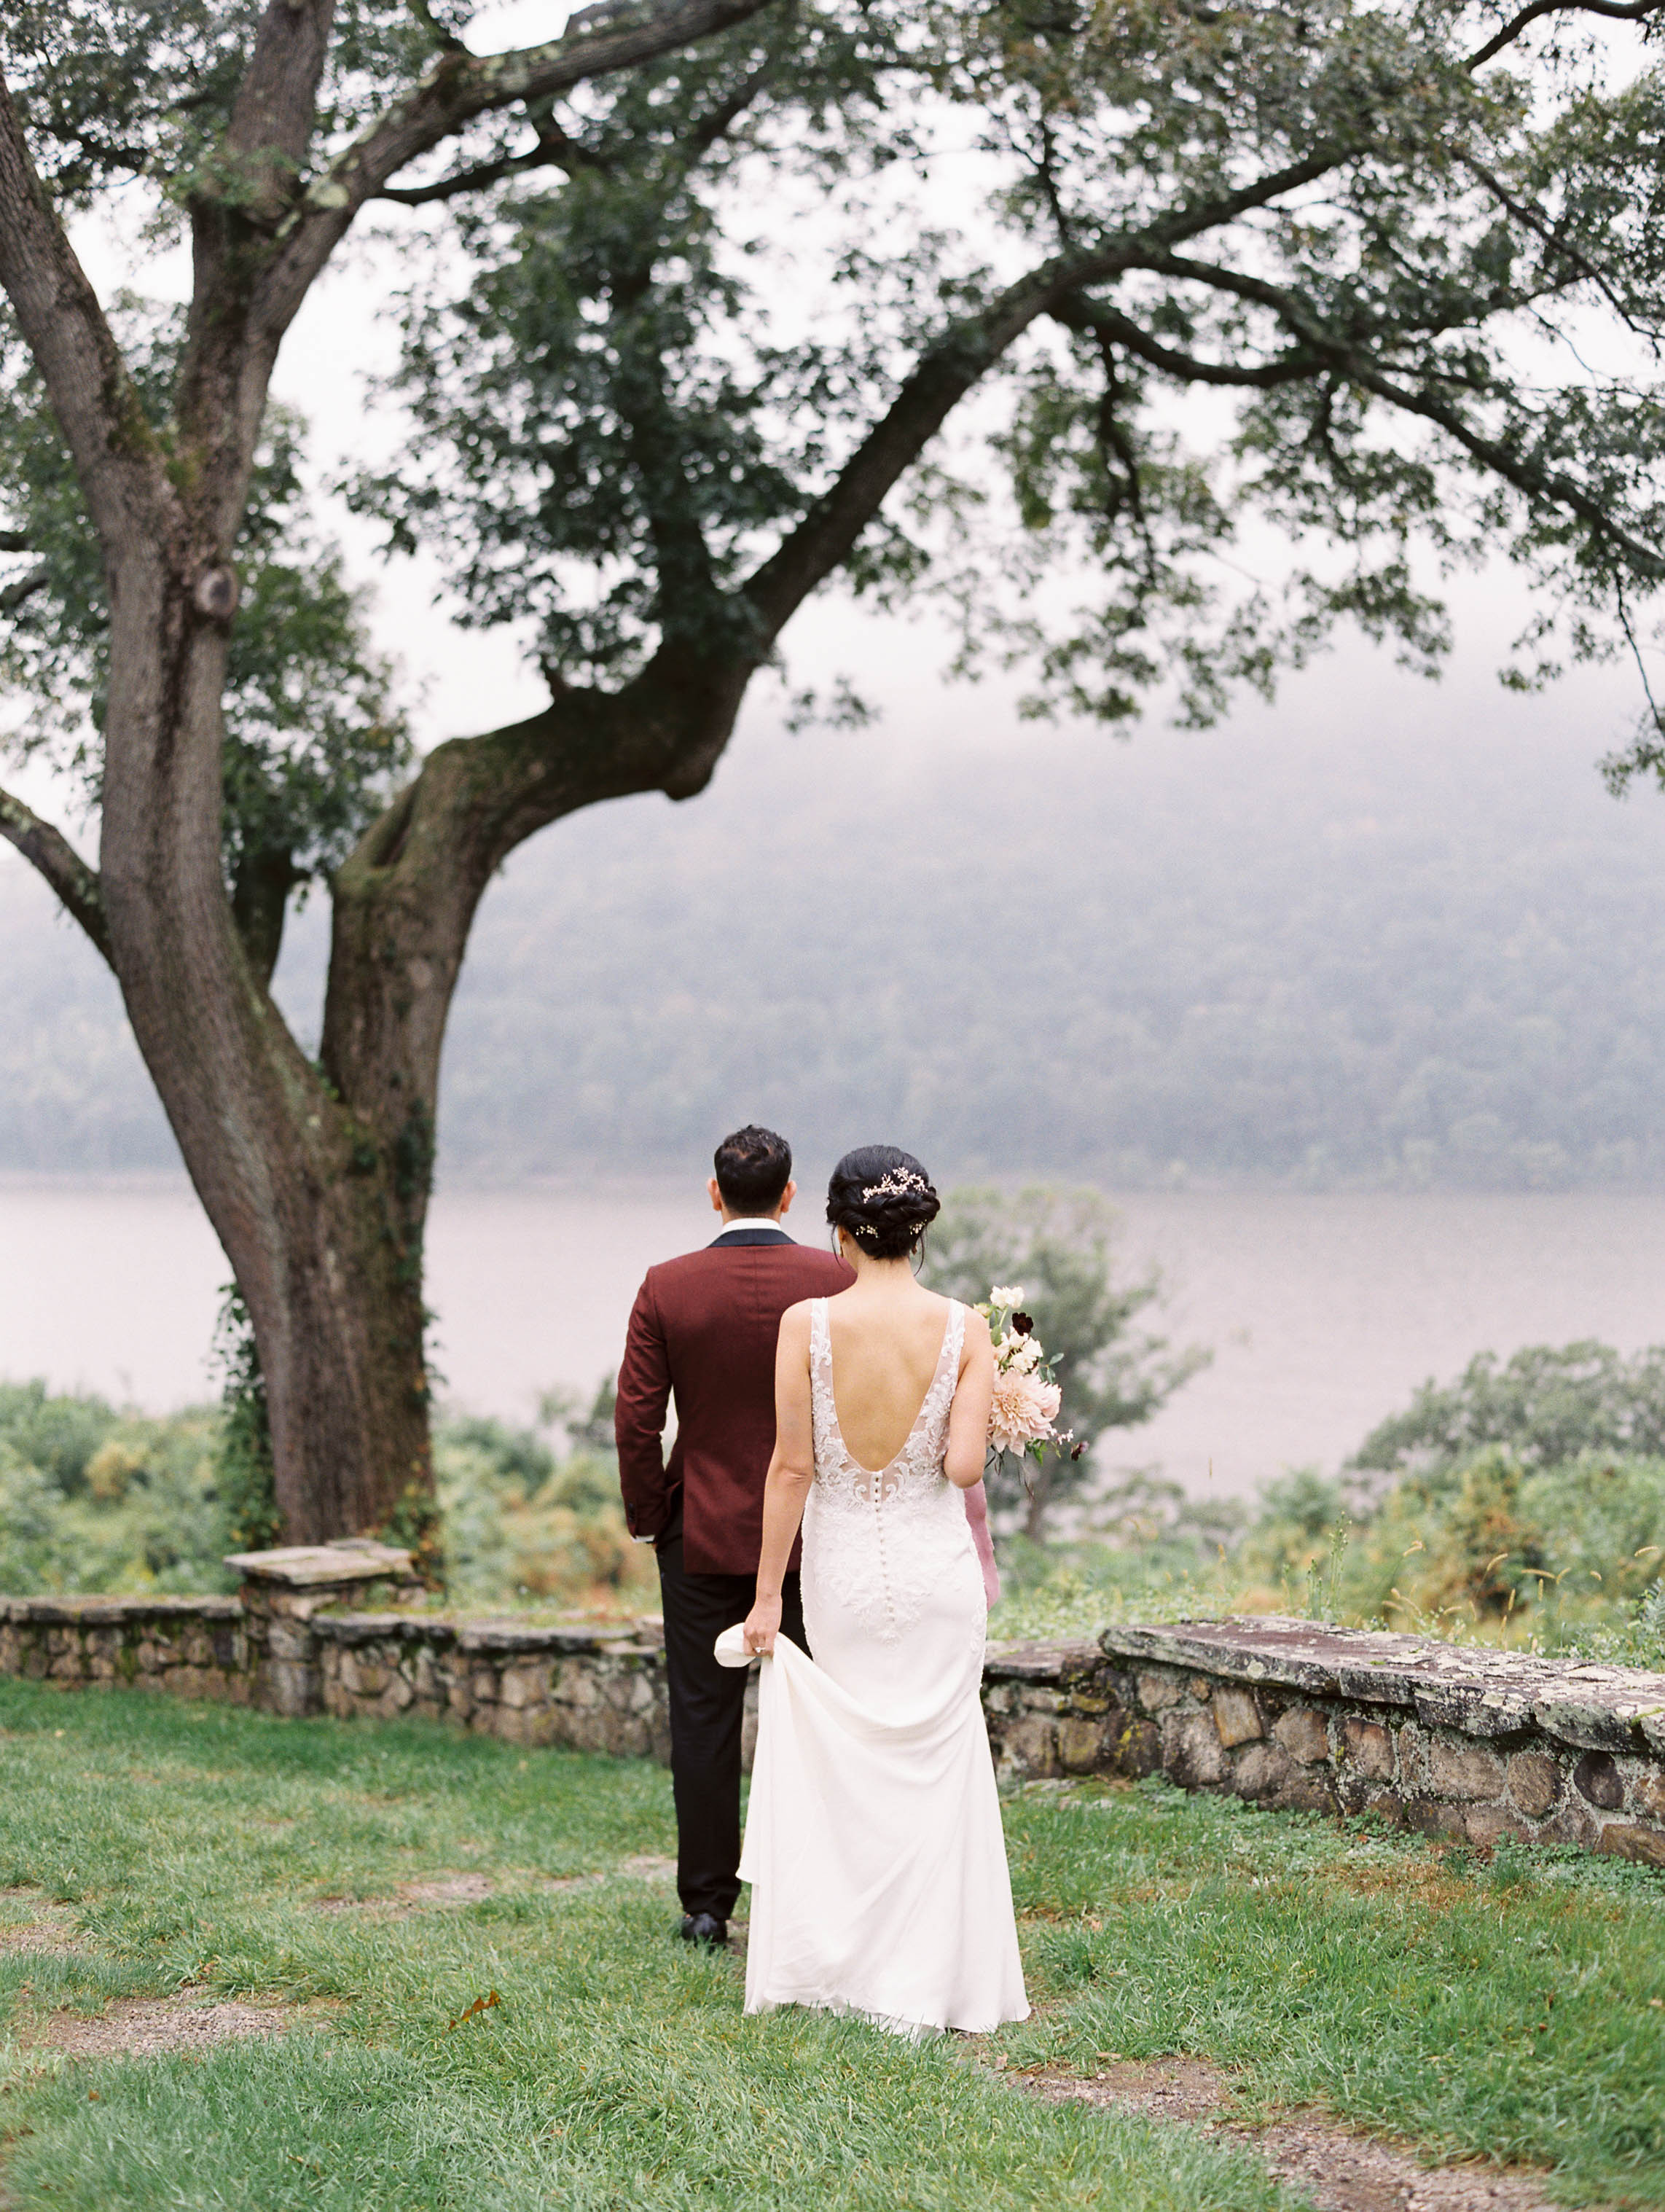 kelsandmichael_weddingphotography_ny-18.jpg